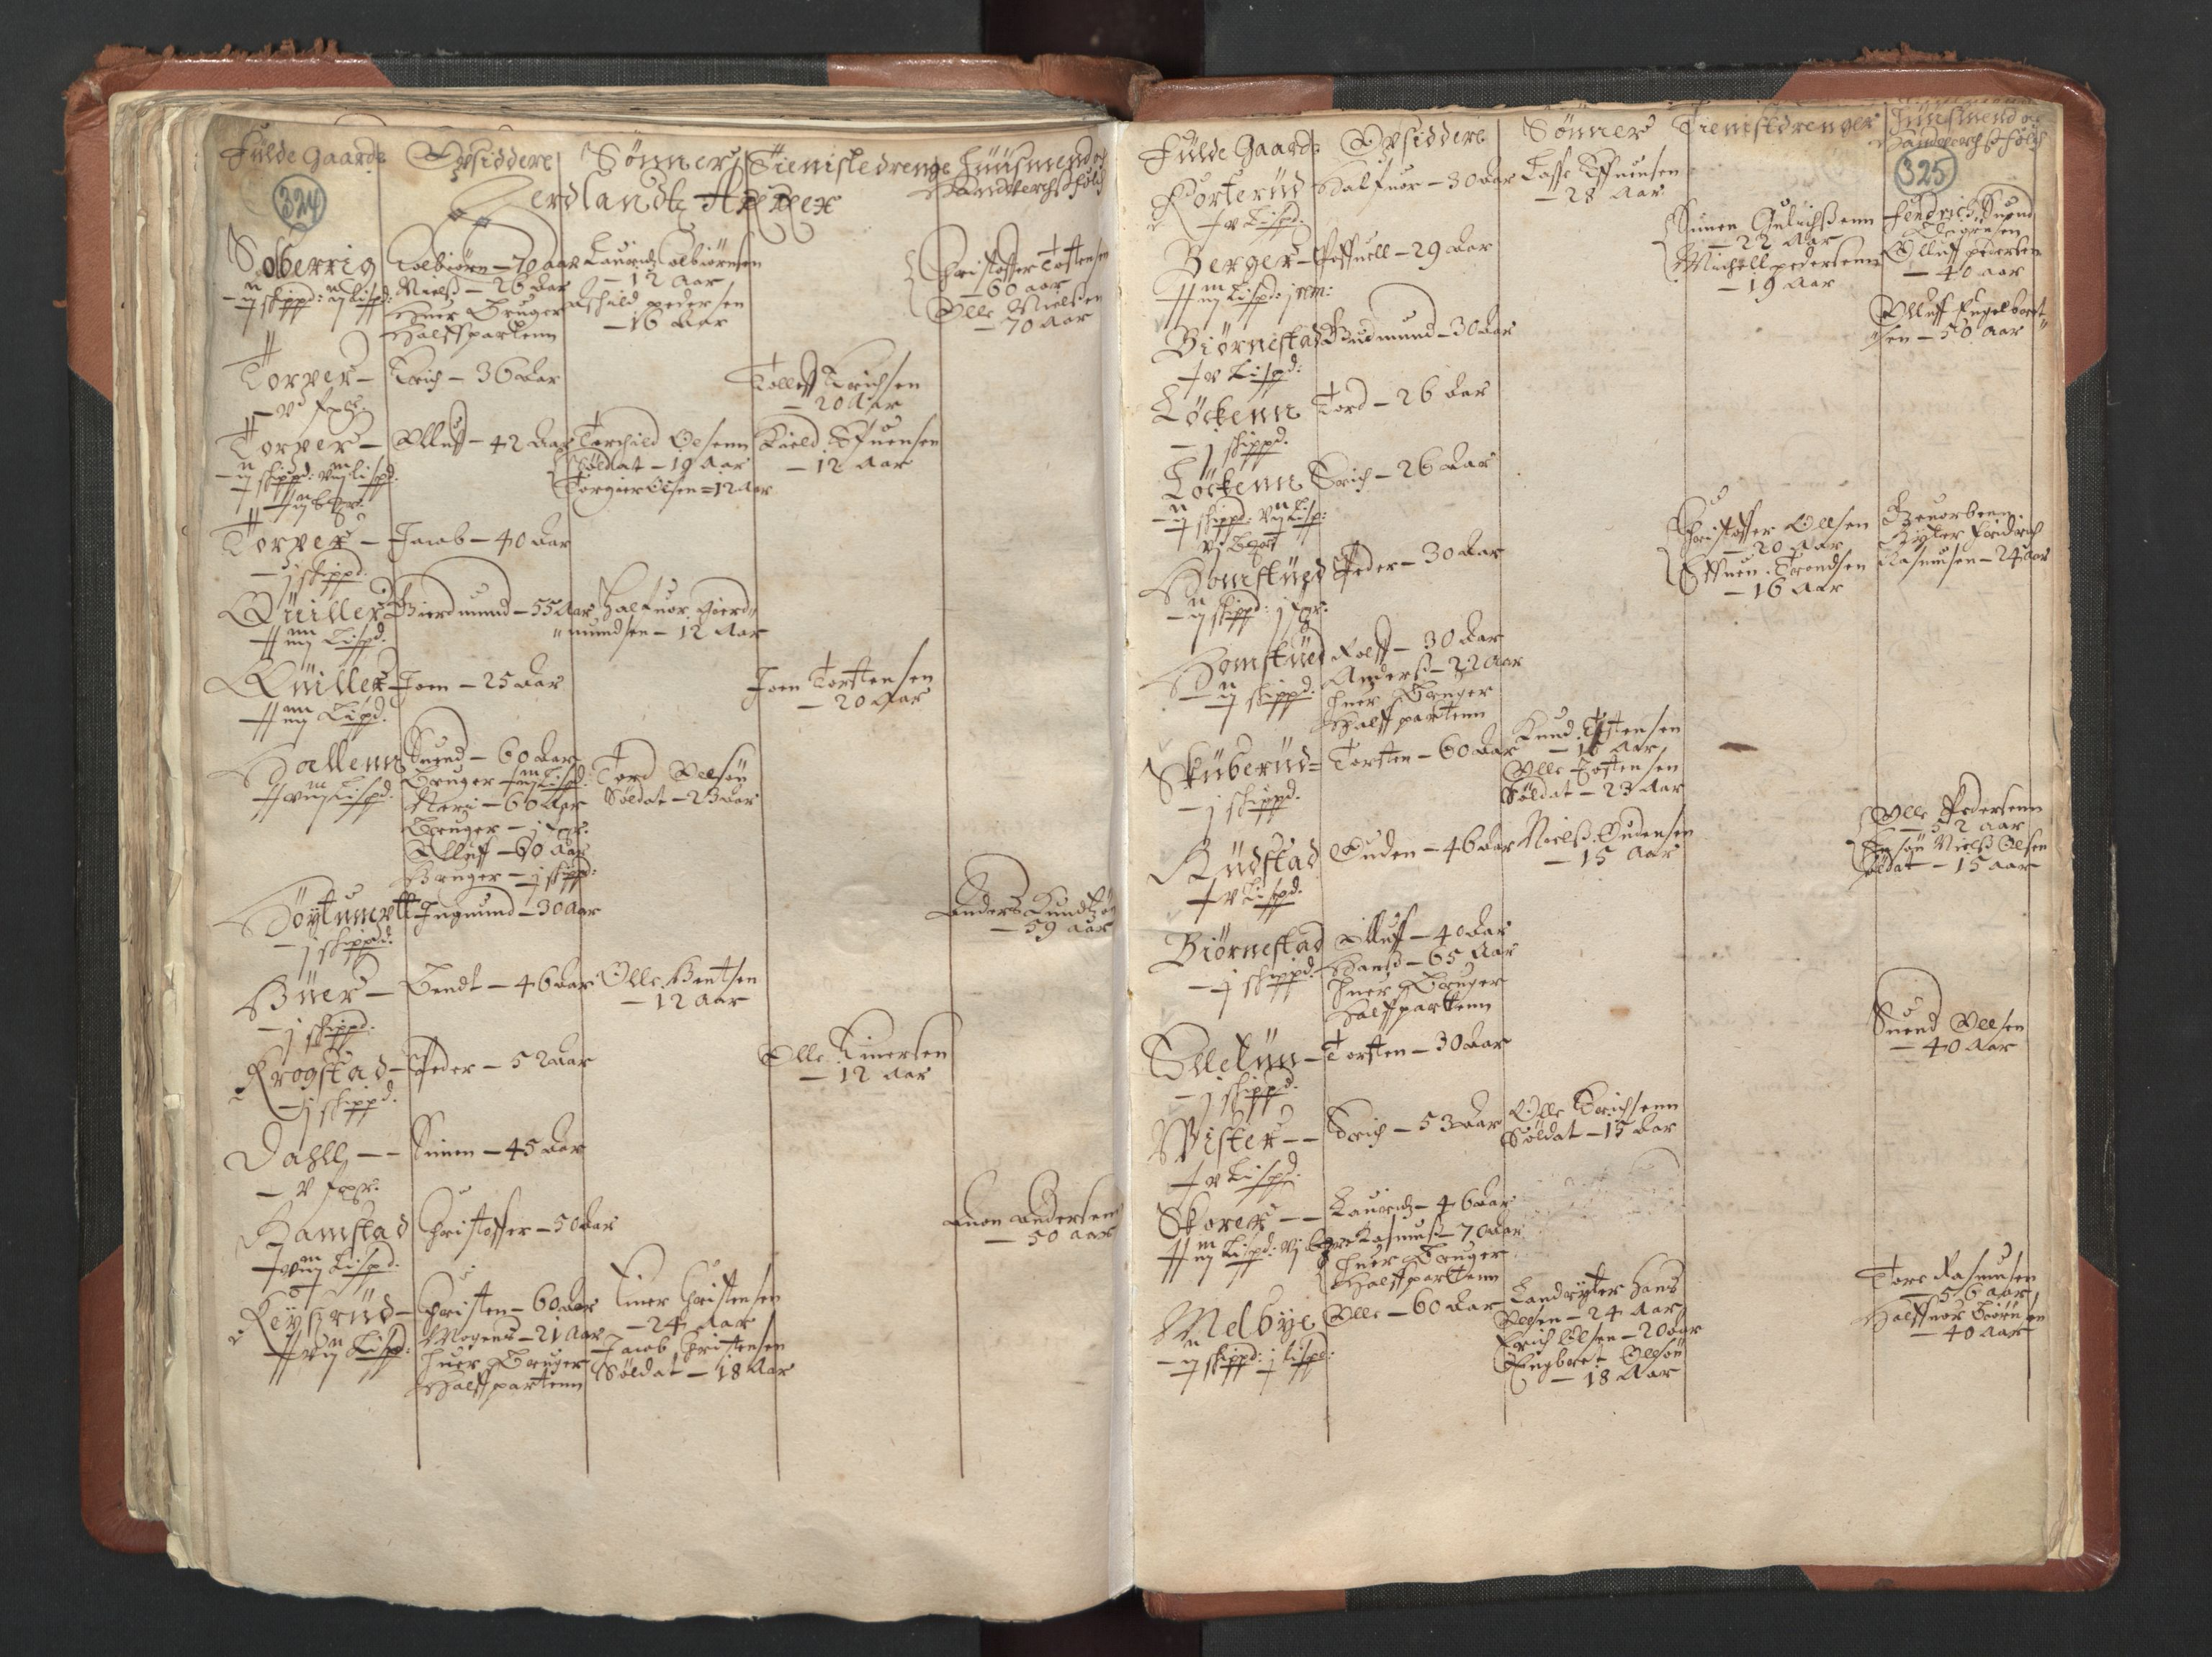 RA, Fogdenes og sorenskrivernes manntall 1664-1666, nr. 1: Fogderier (len og skipreider) i nåværende Østfold fylke, 1664, s. 324-325